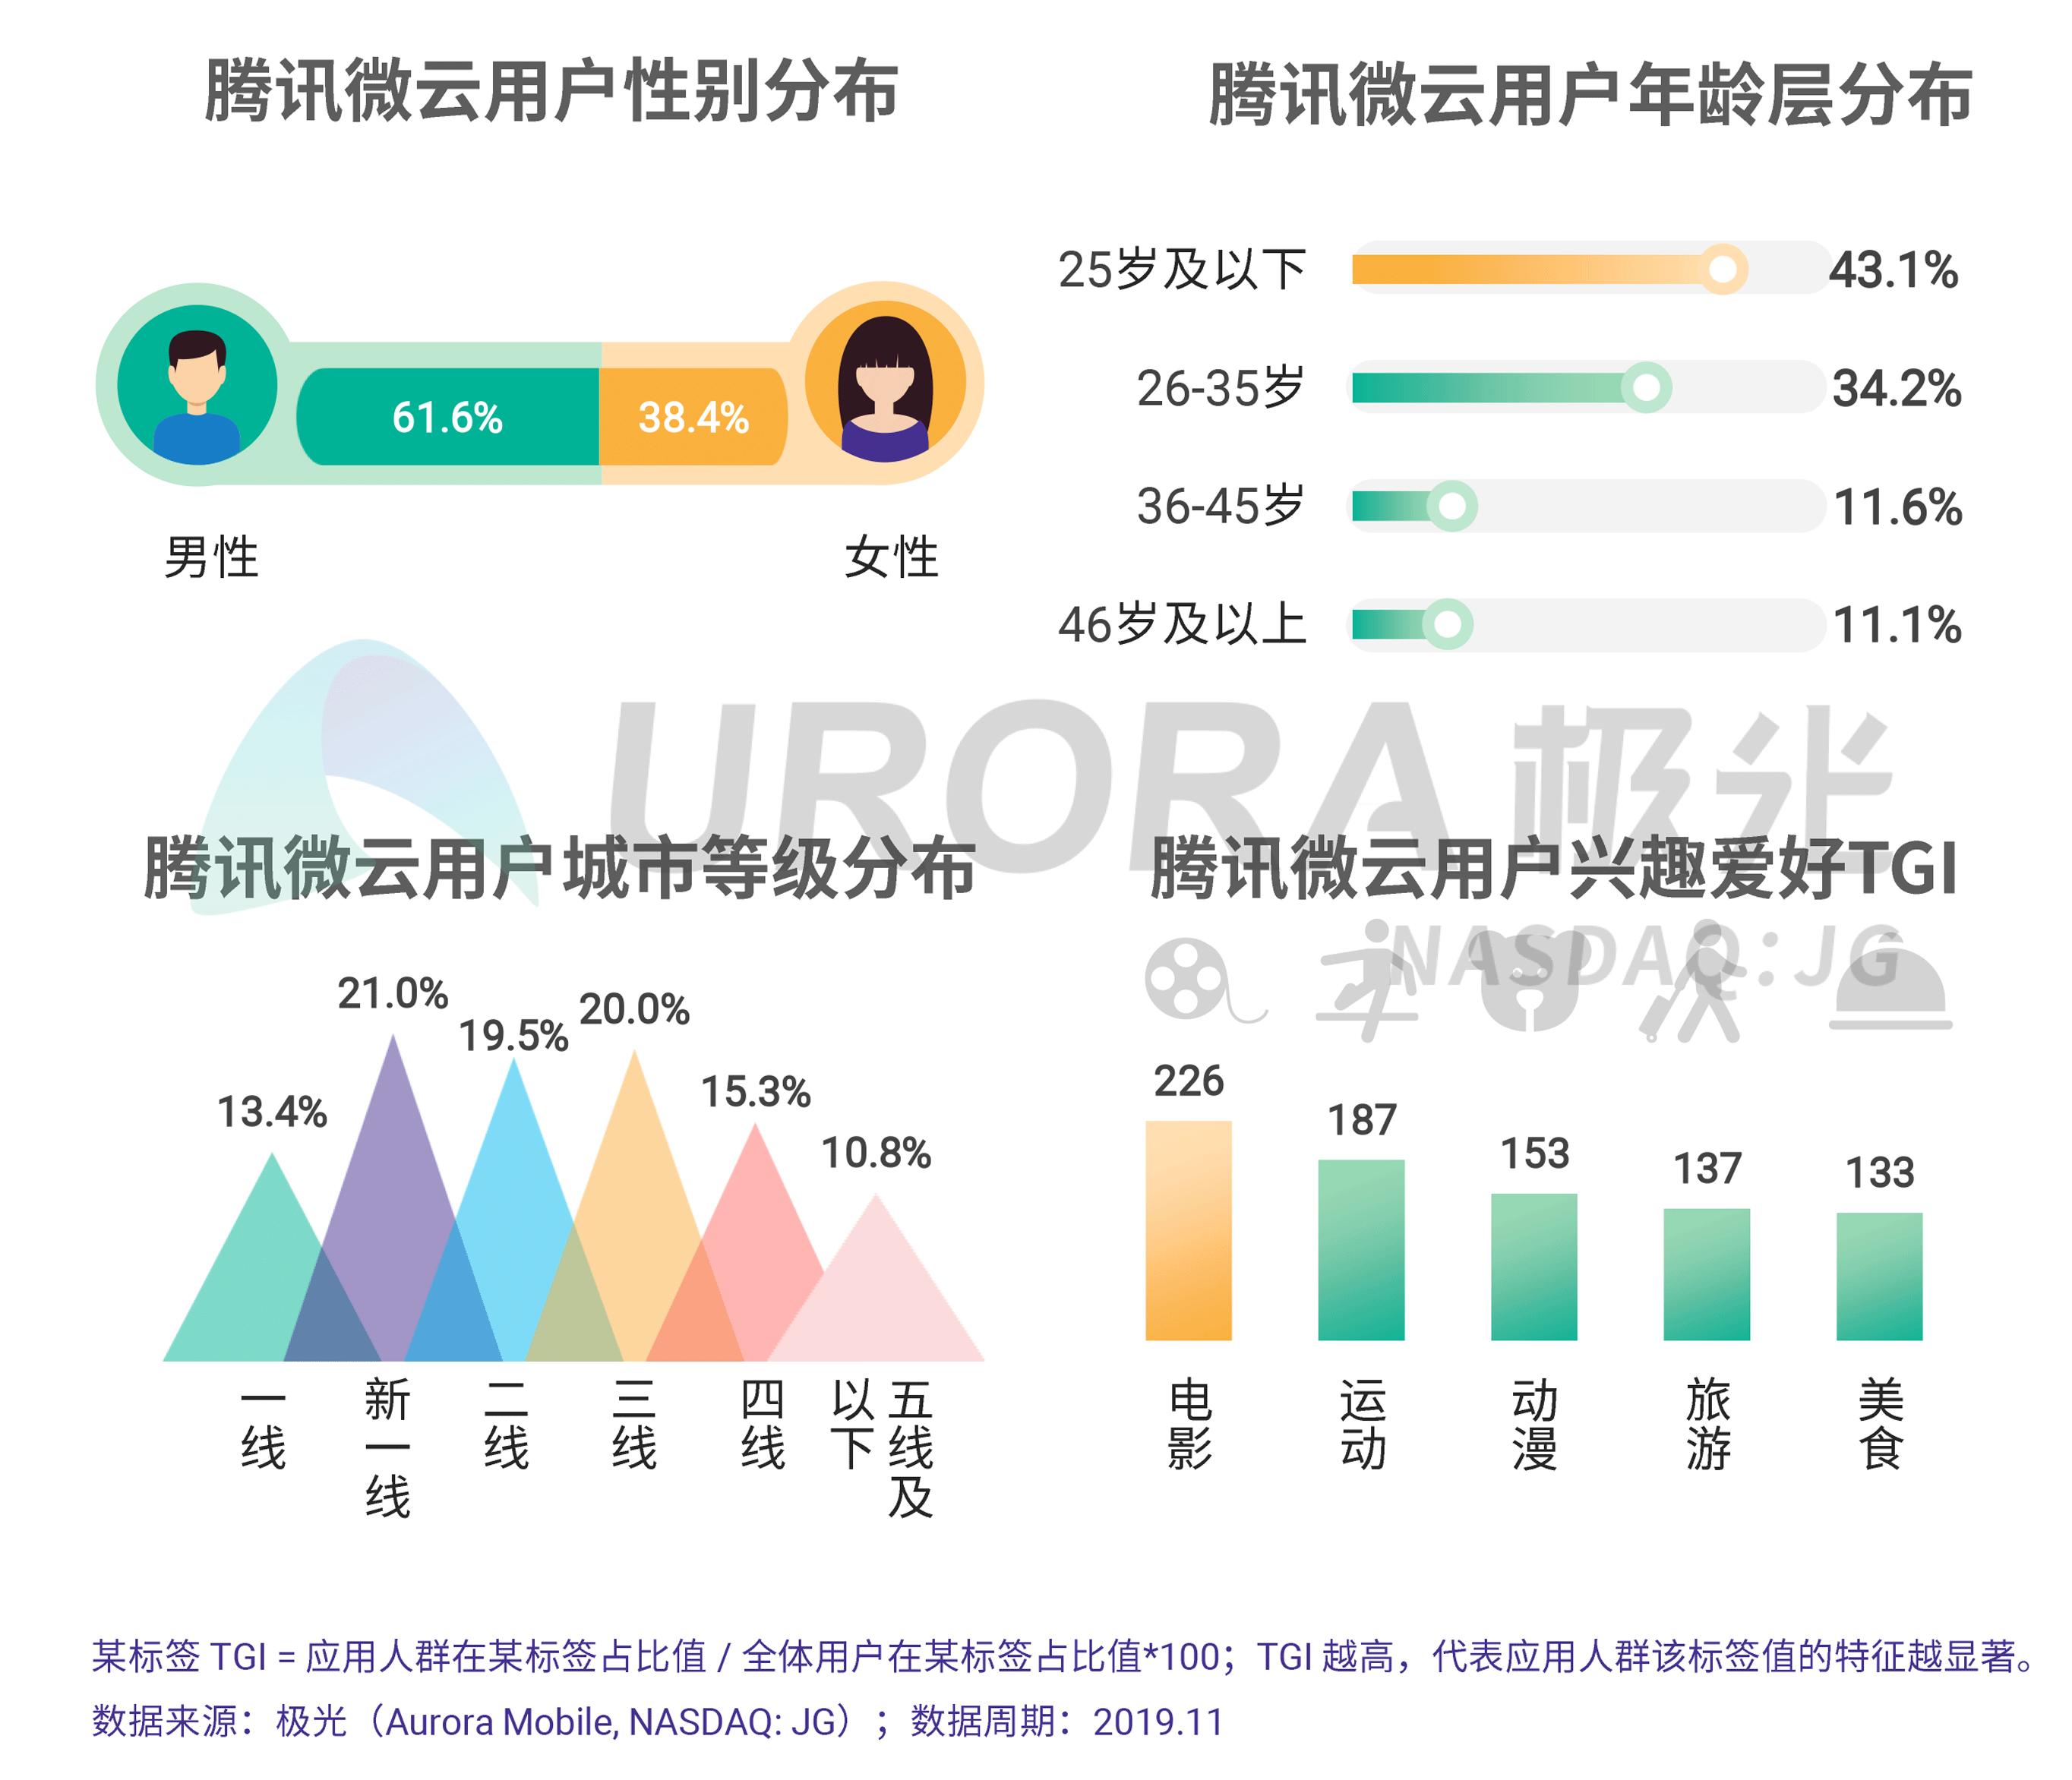 JIGUANG-个人网盘行业研究报告-final---切图版2-22.png